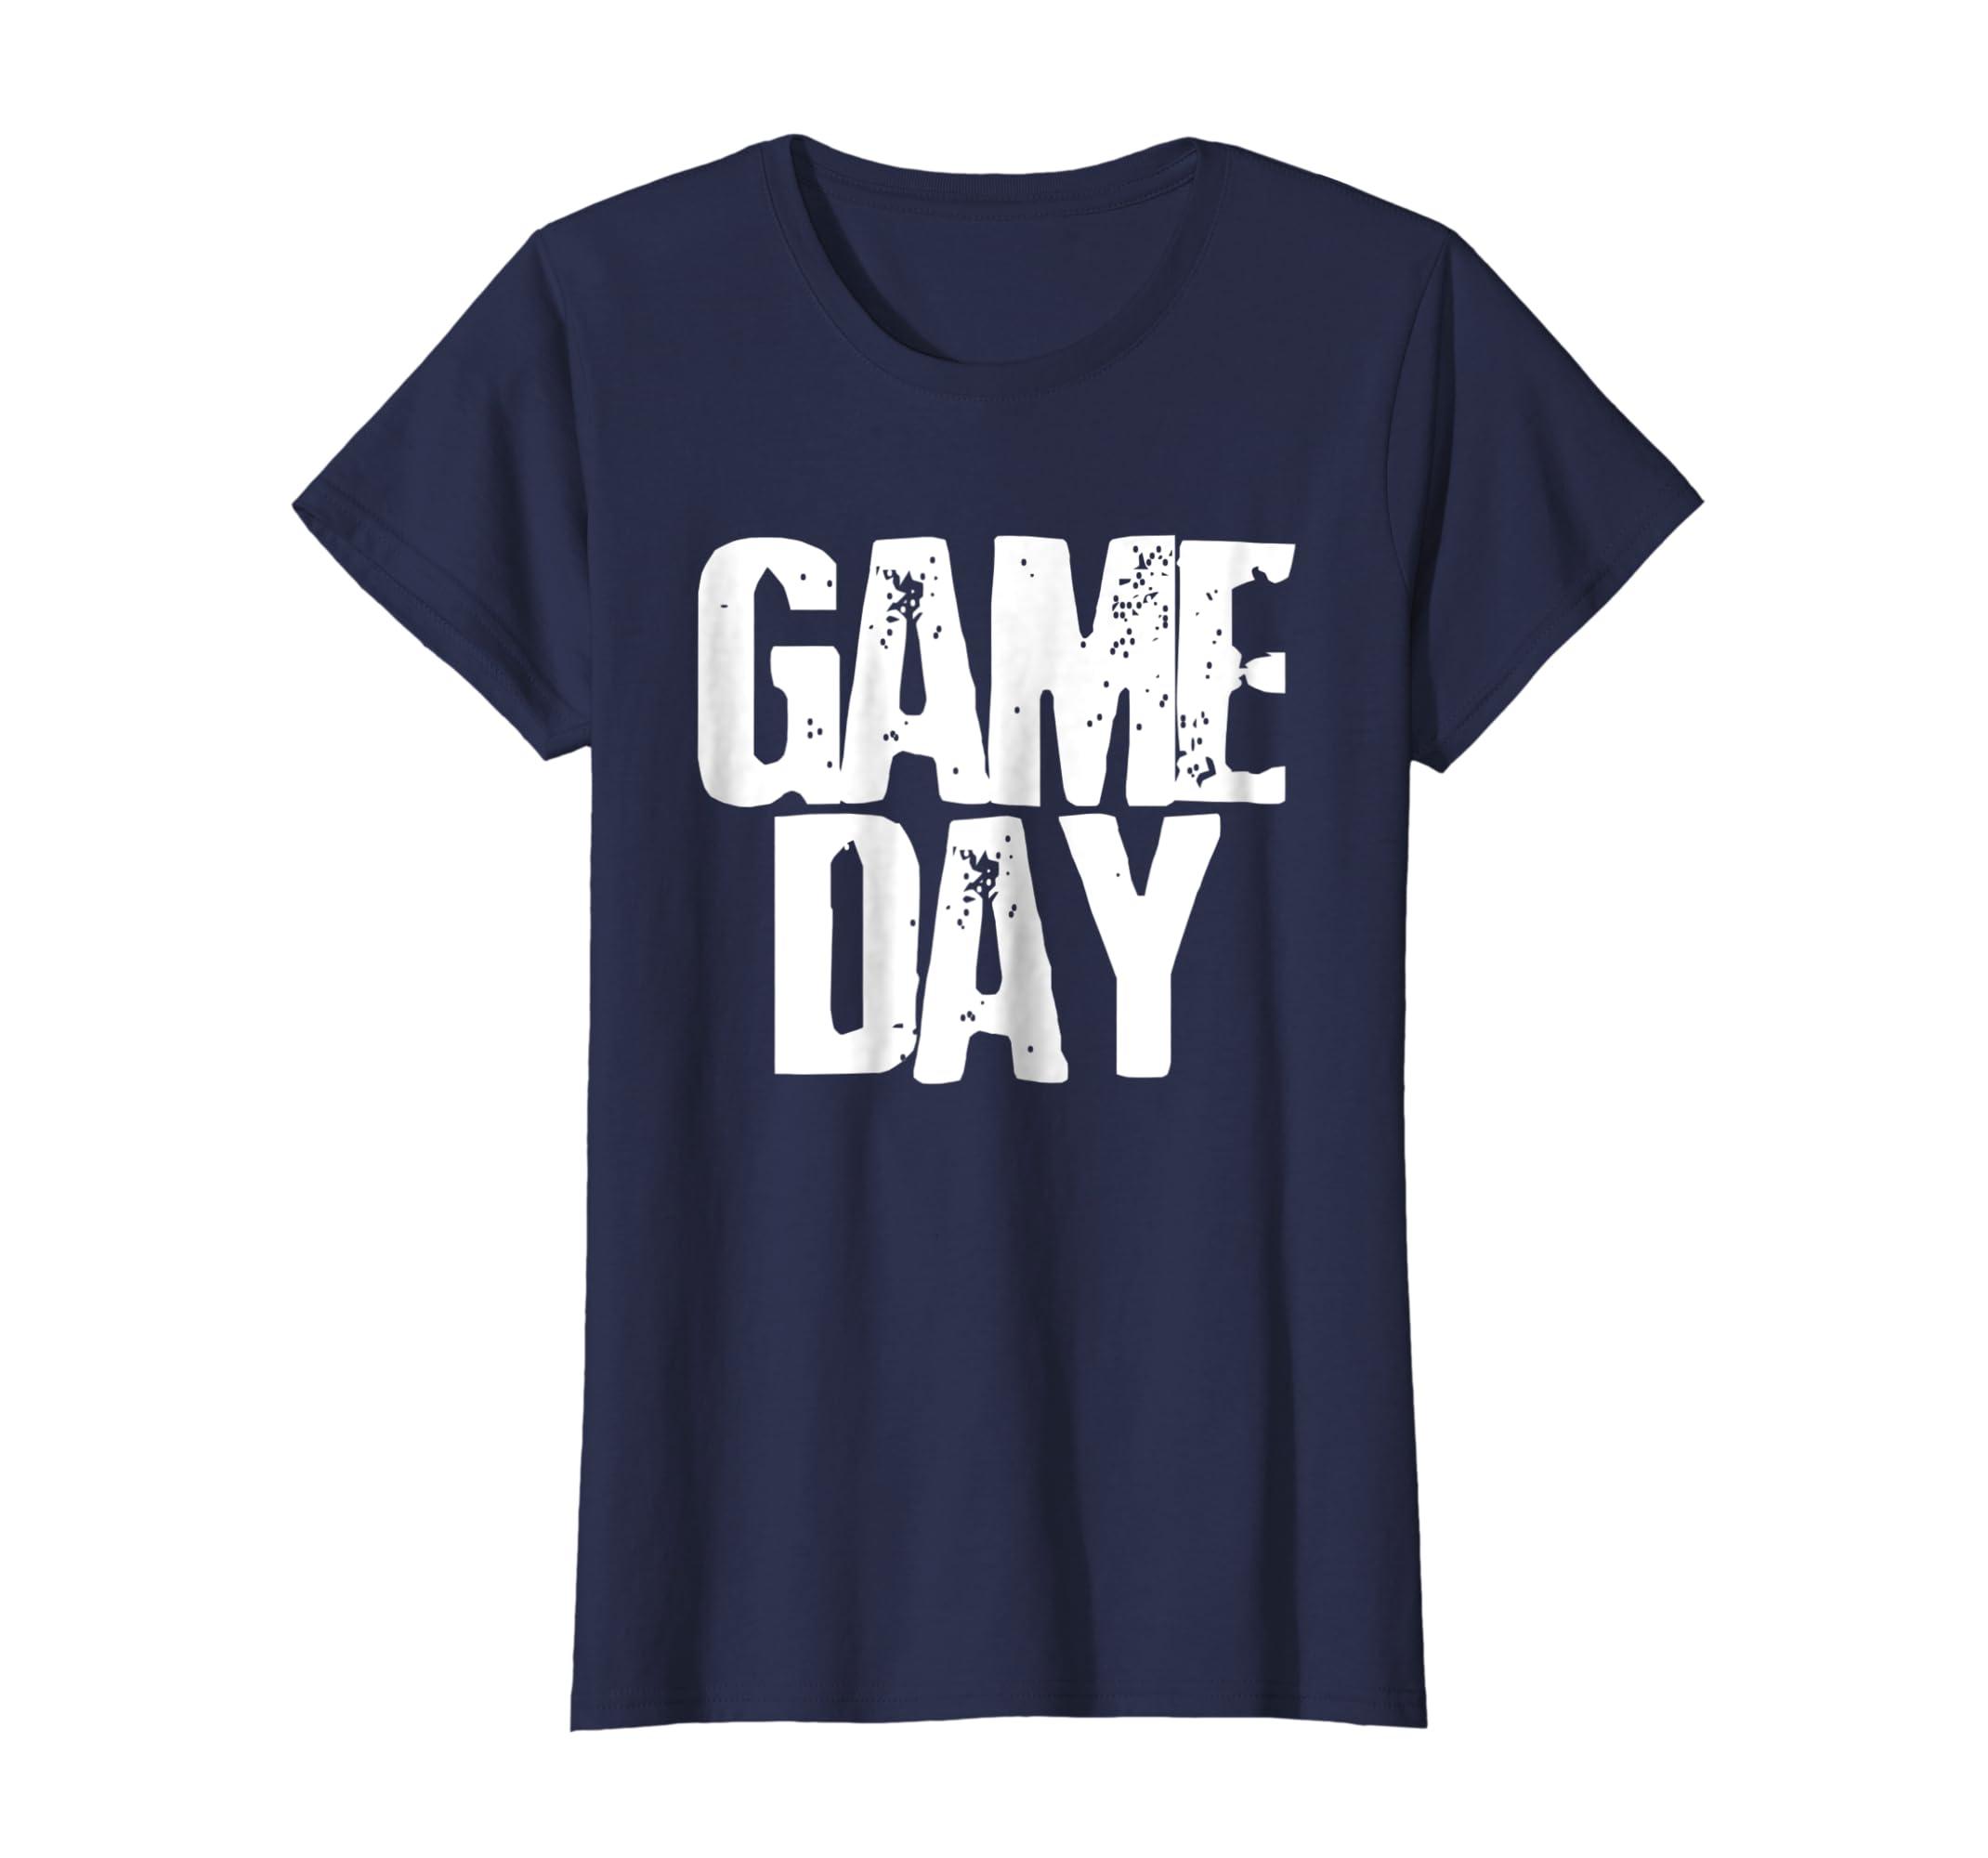 6d2932925 Amazon.com  Vintage Football Game T Shirt Women Men Cute Top Gifts  Clothing